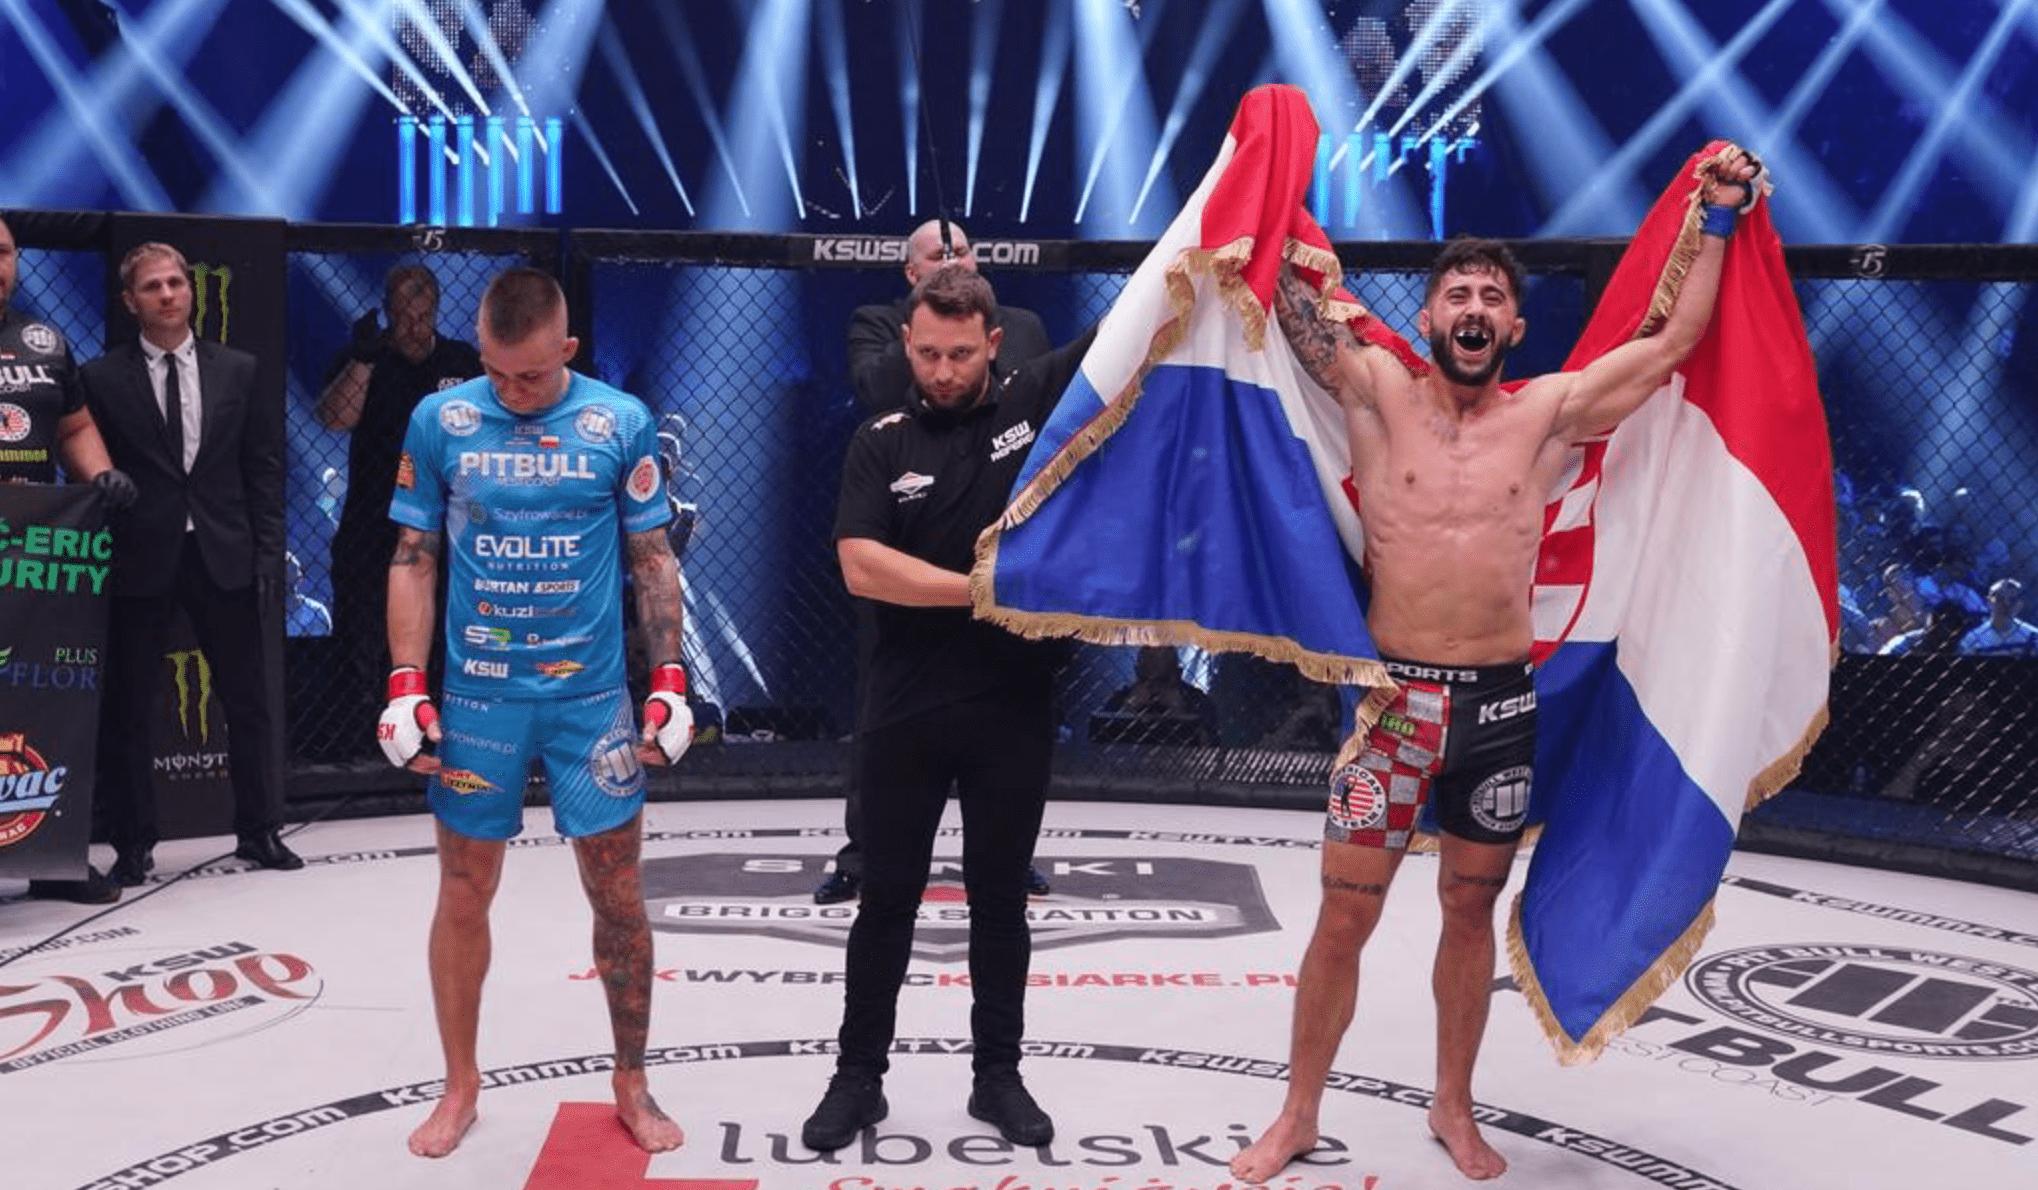 Croatia's Filip Pejic To Fight At KSW 51